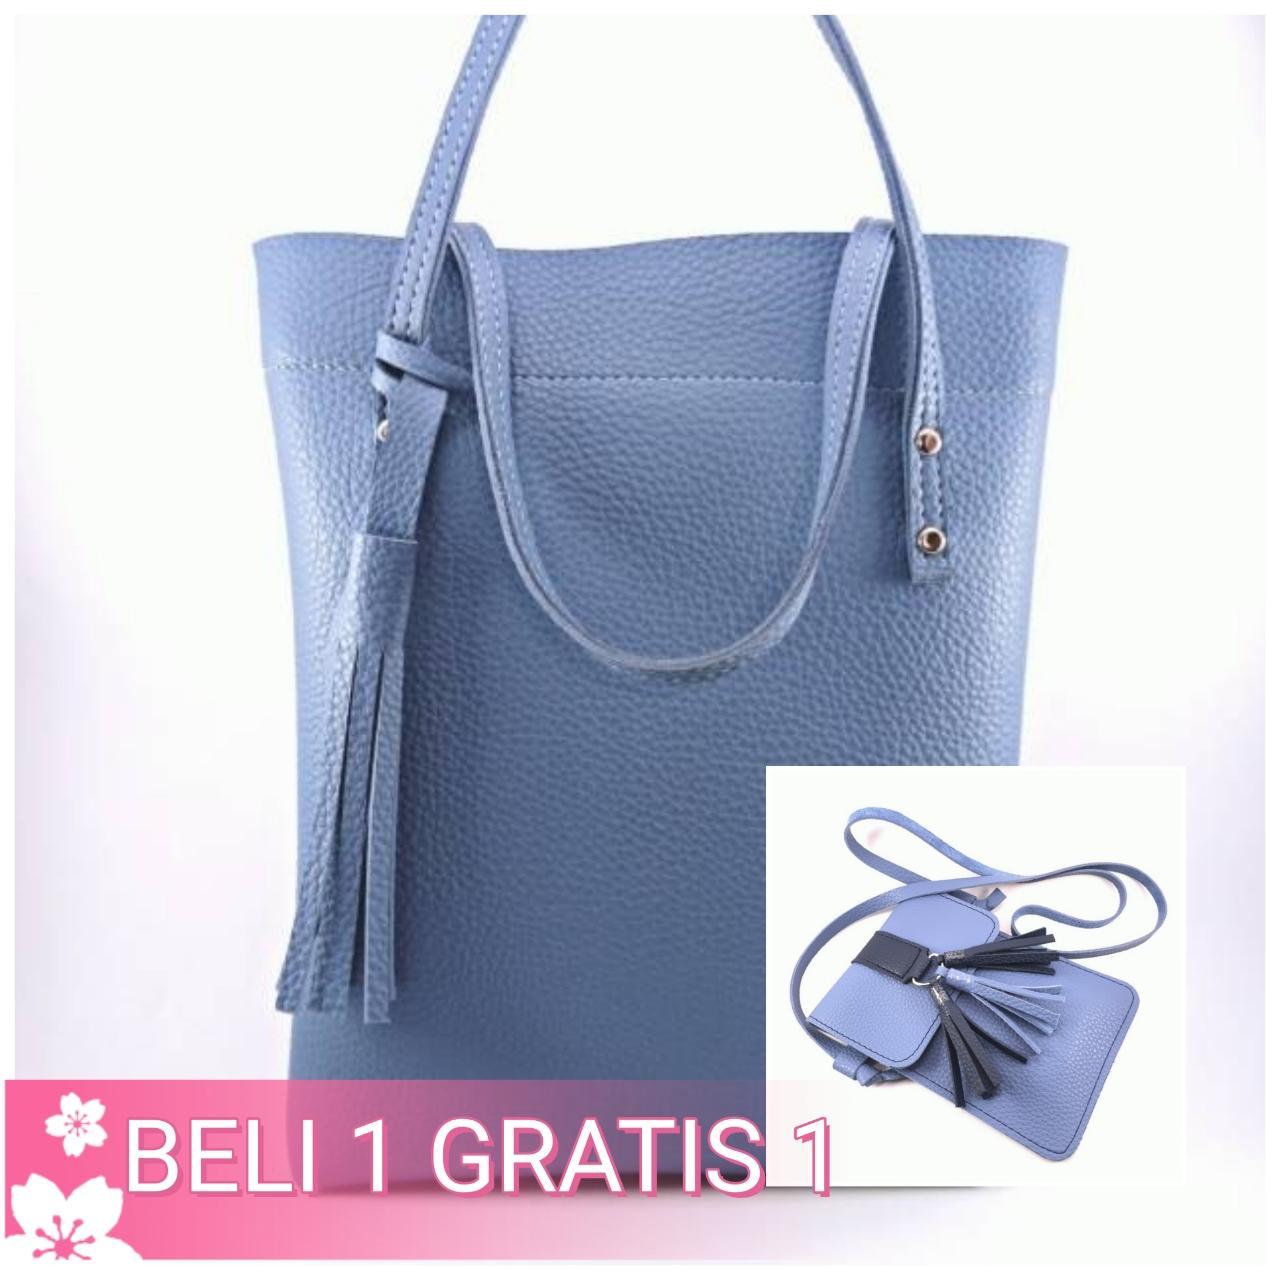 Tas Wanita Fashion Kulit PU Tote Leather Handbags Shoulder Bags - Hitam (